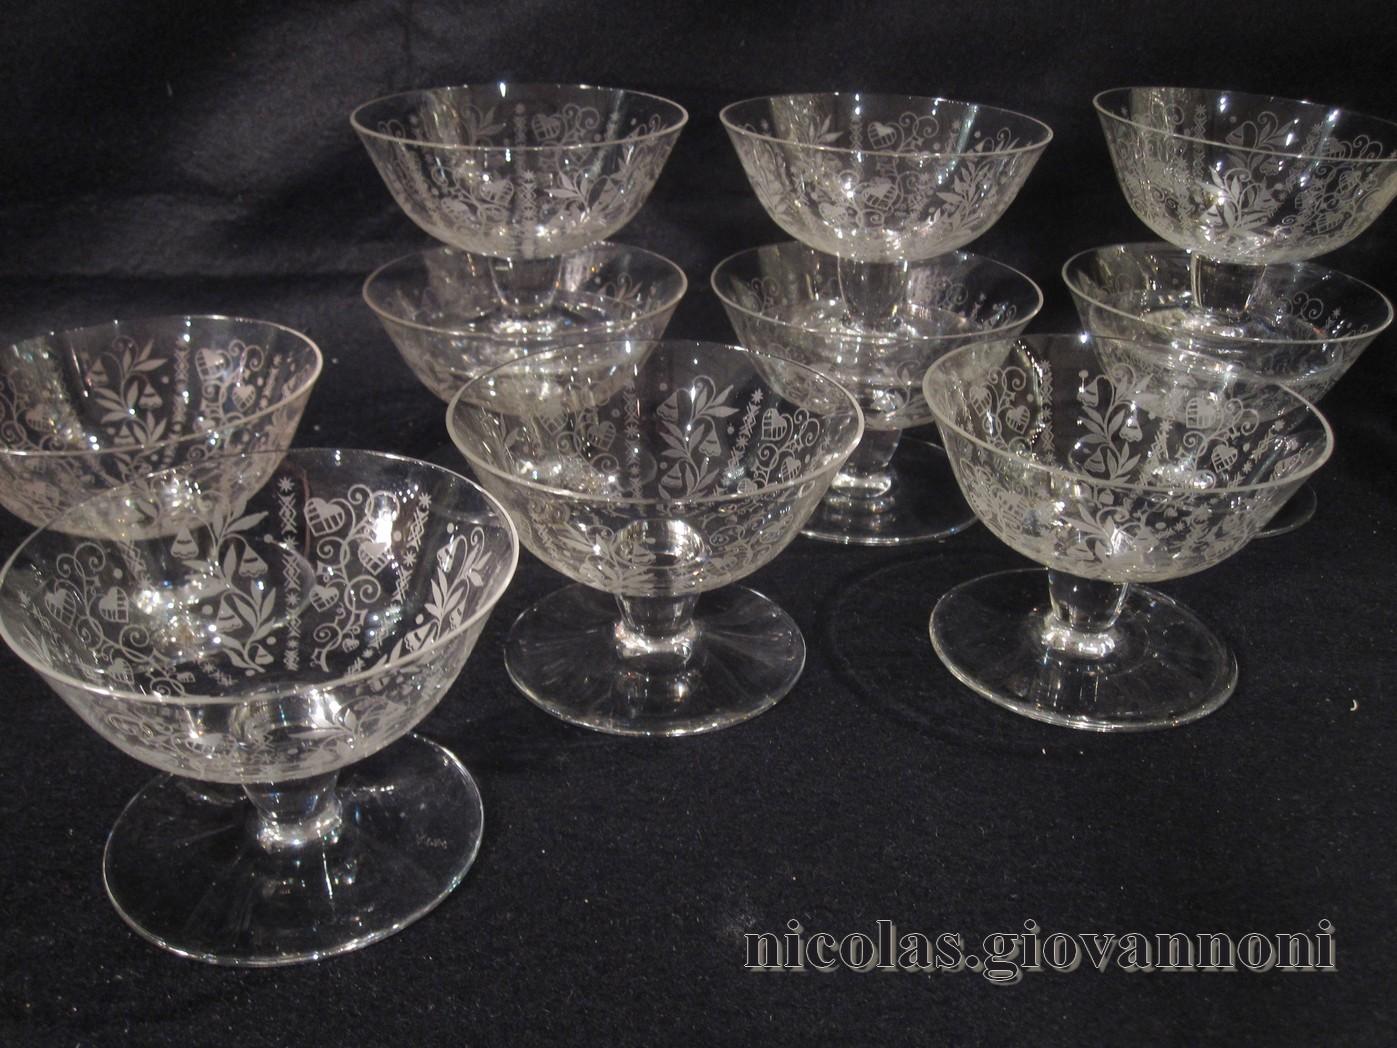 11 coupes champagne delvaux cristal catalogue cristal de france nicolas giovannoni. Black Bedroom Furniture Sets. Home Design Ideas